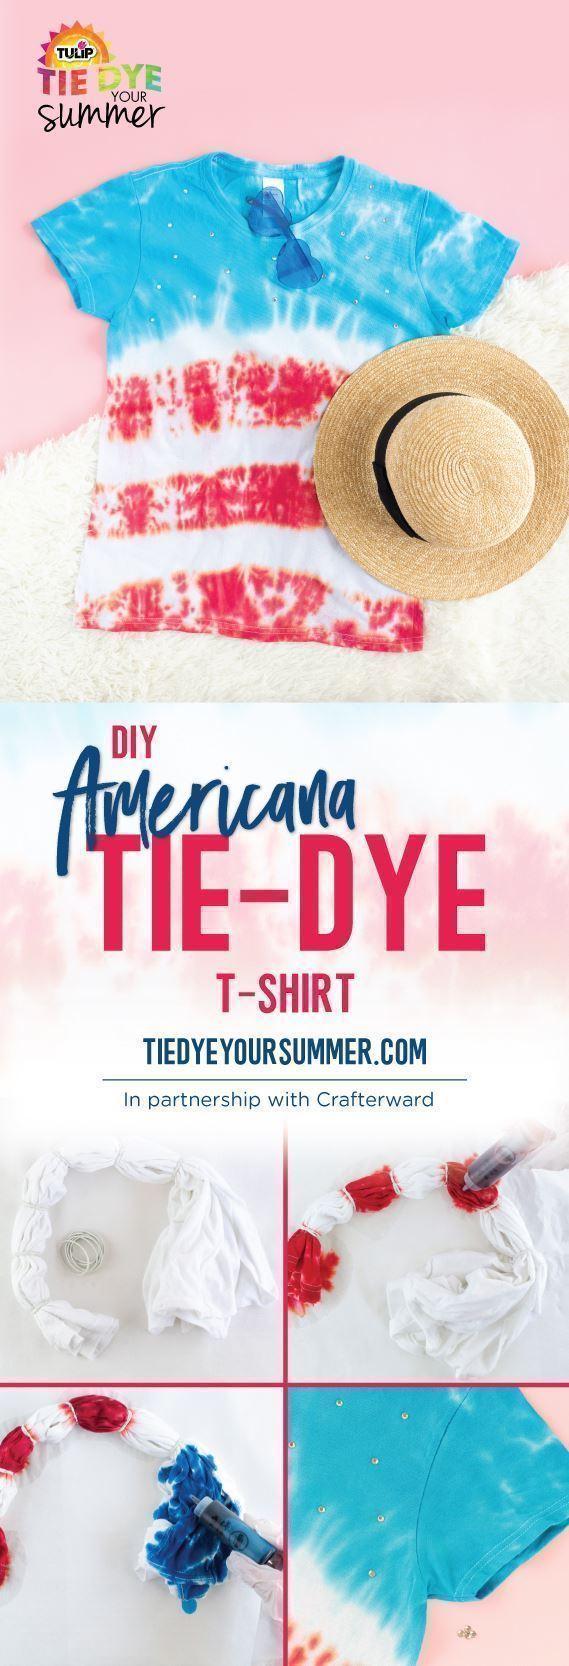 Tulip DIY Americana Tie-Dye T-shirt